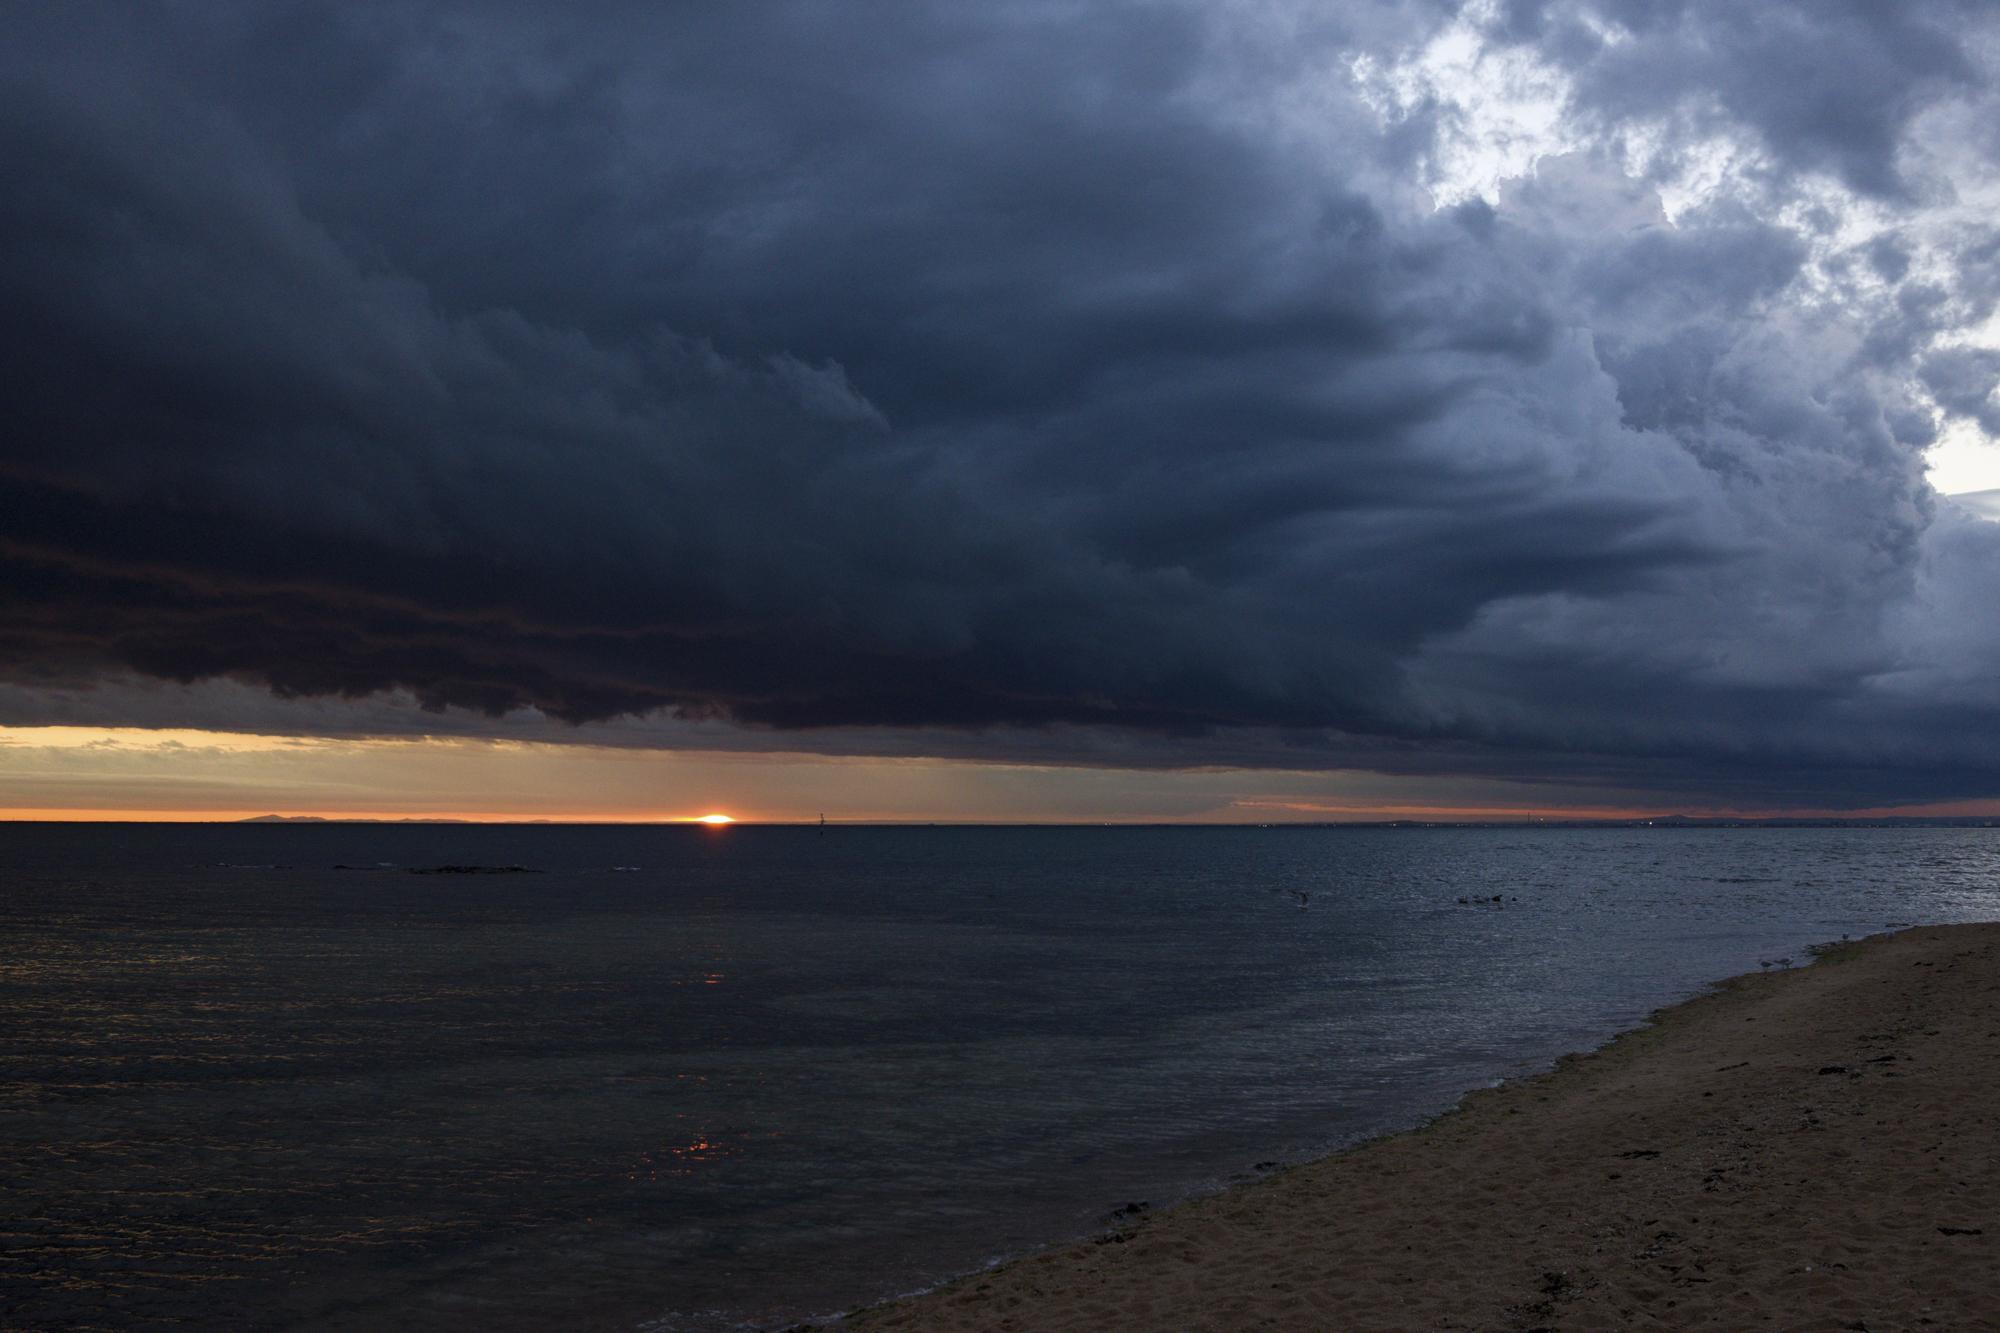 Sunset at Brighton Beach. Melbourne, Australia 2018.  ©  Danny Imson. Leica CL, Leica Summicron-TL 23mm F/2 ASPH